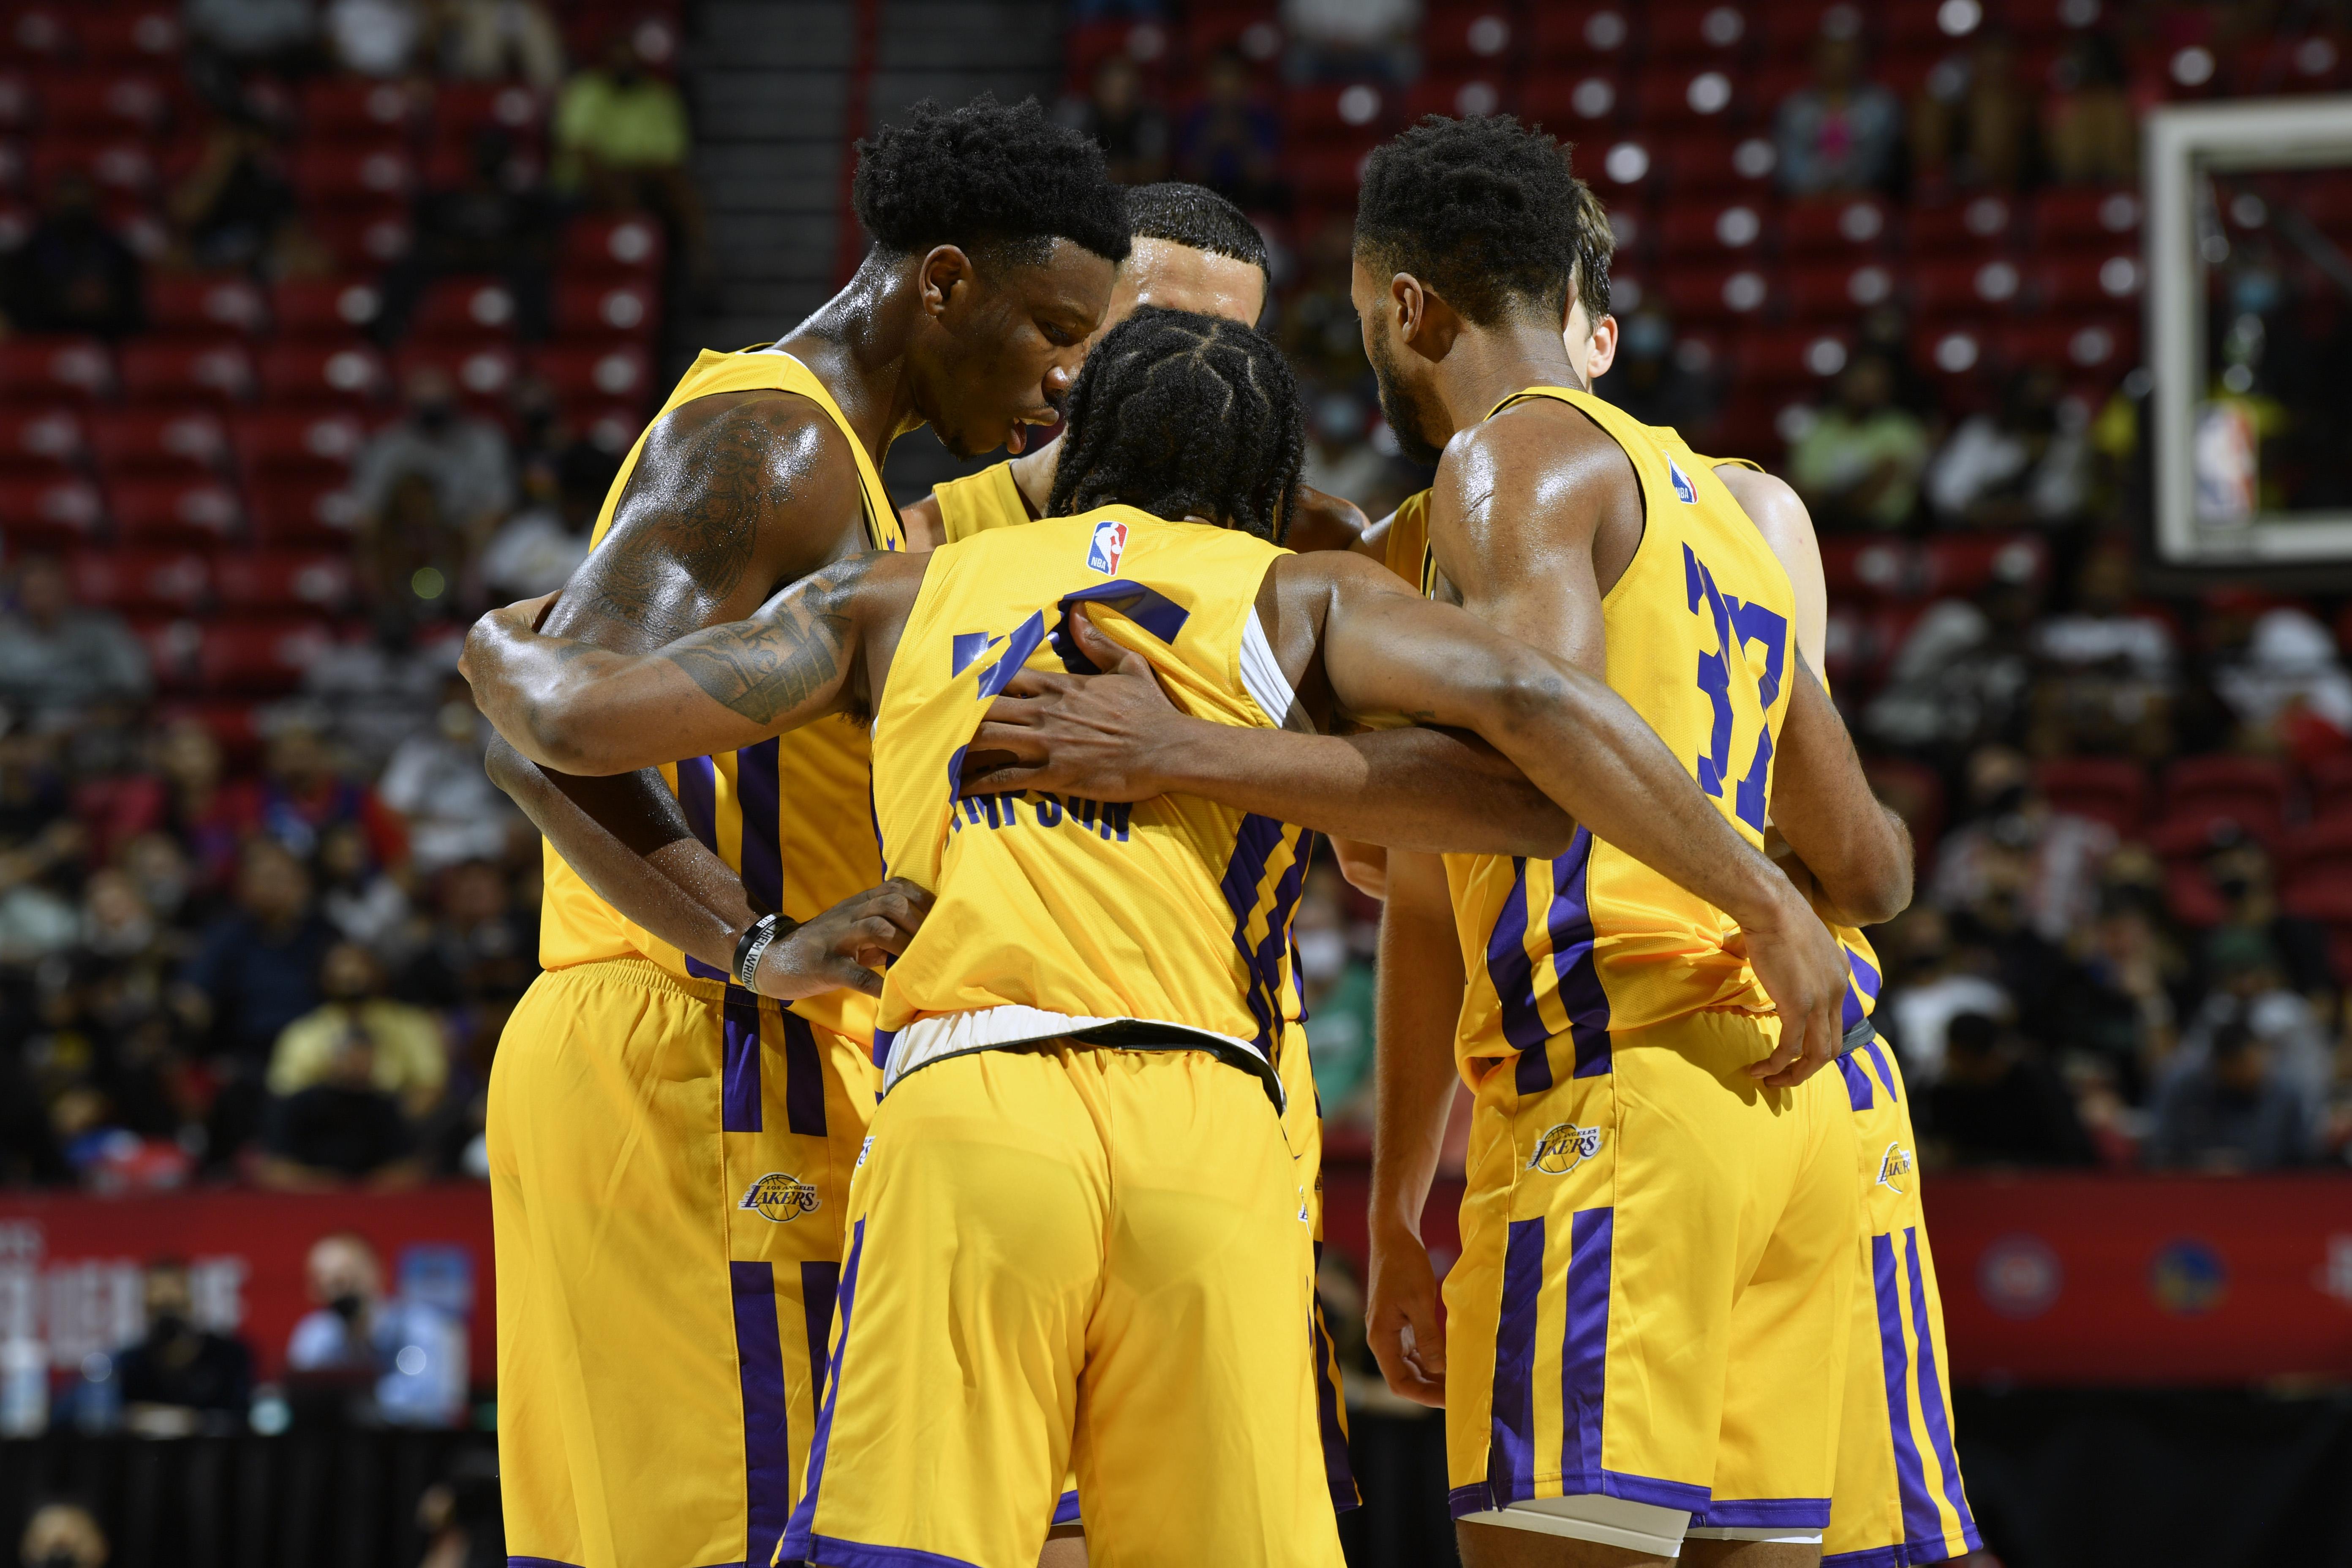 2021 Las Vegas Summer League - Los Angeles Lakers v LA Clippers